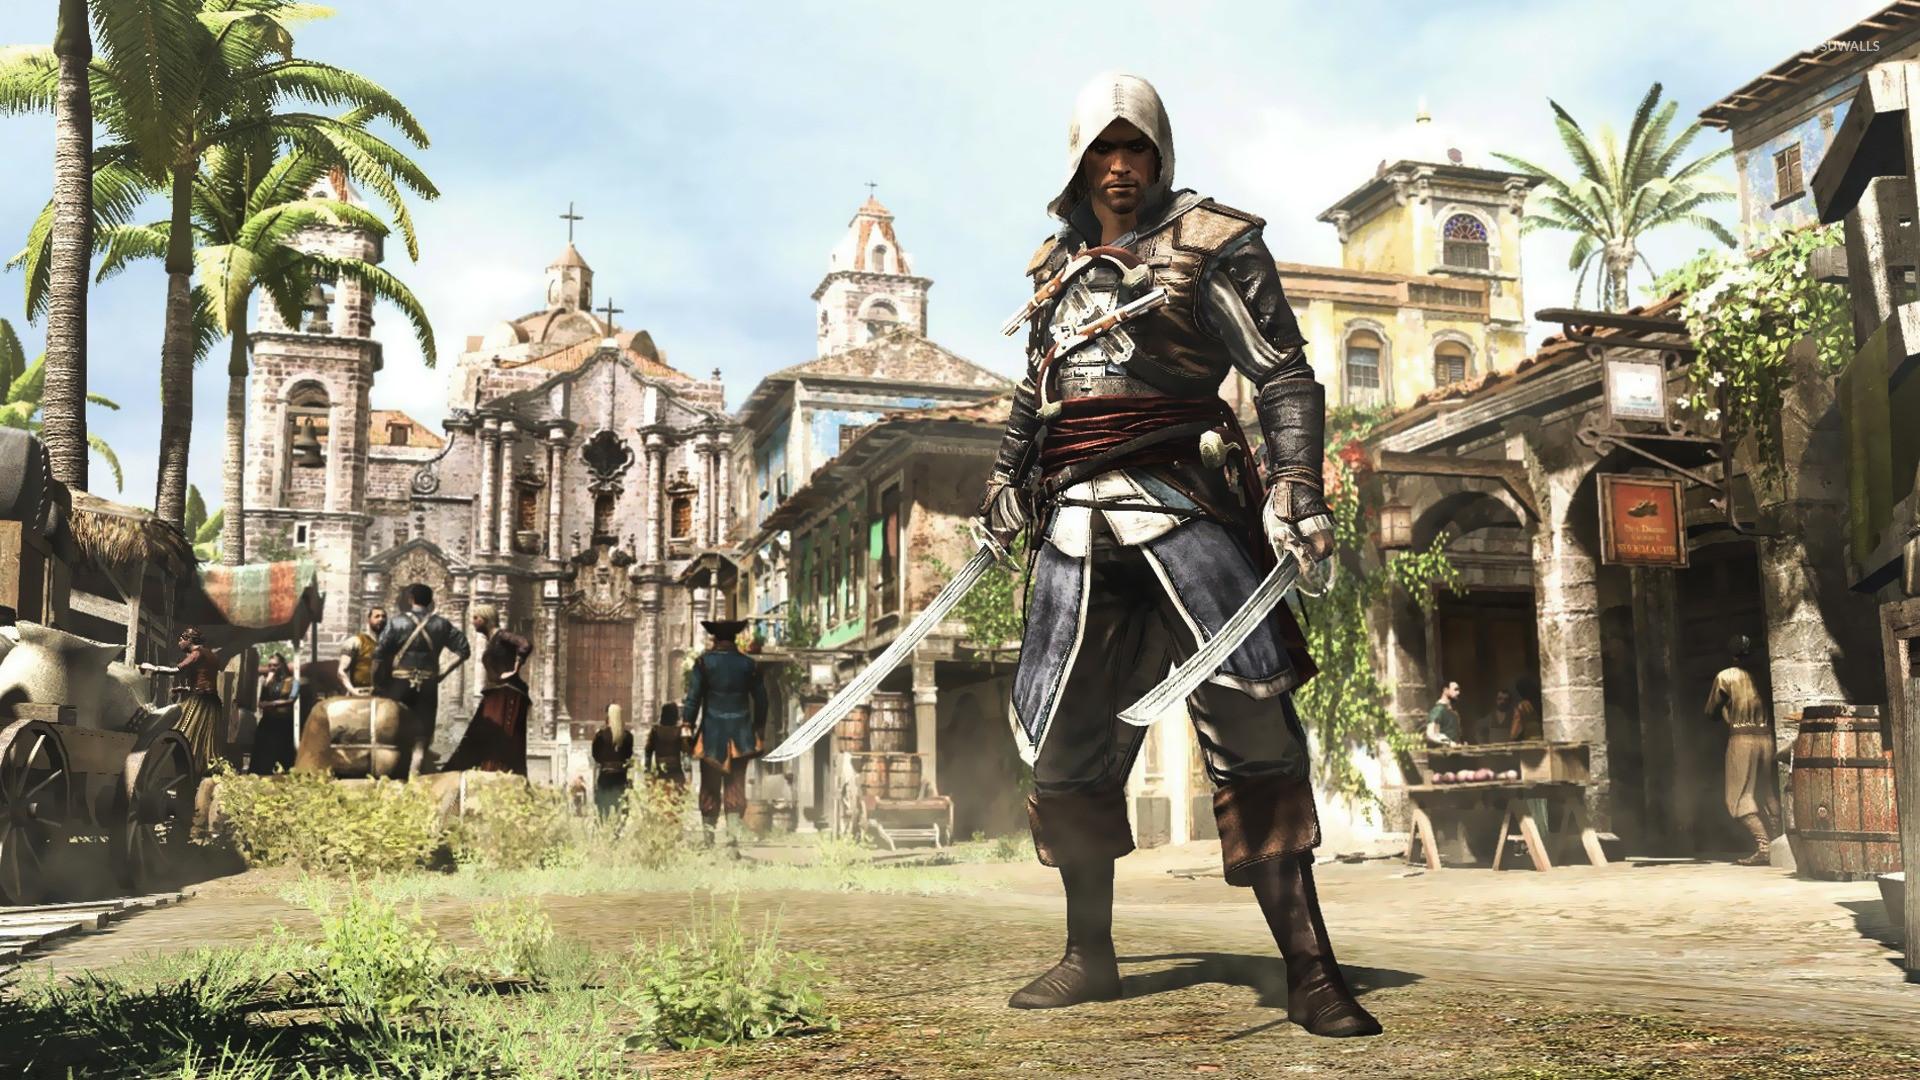 Edward Kenway – Assassin's Creed IV: Black Flag [4] wallpaper